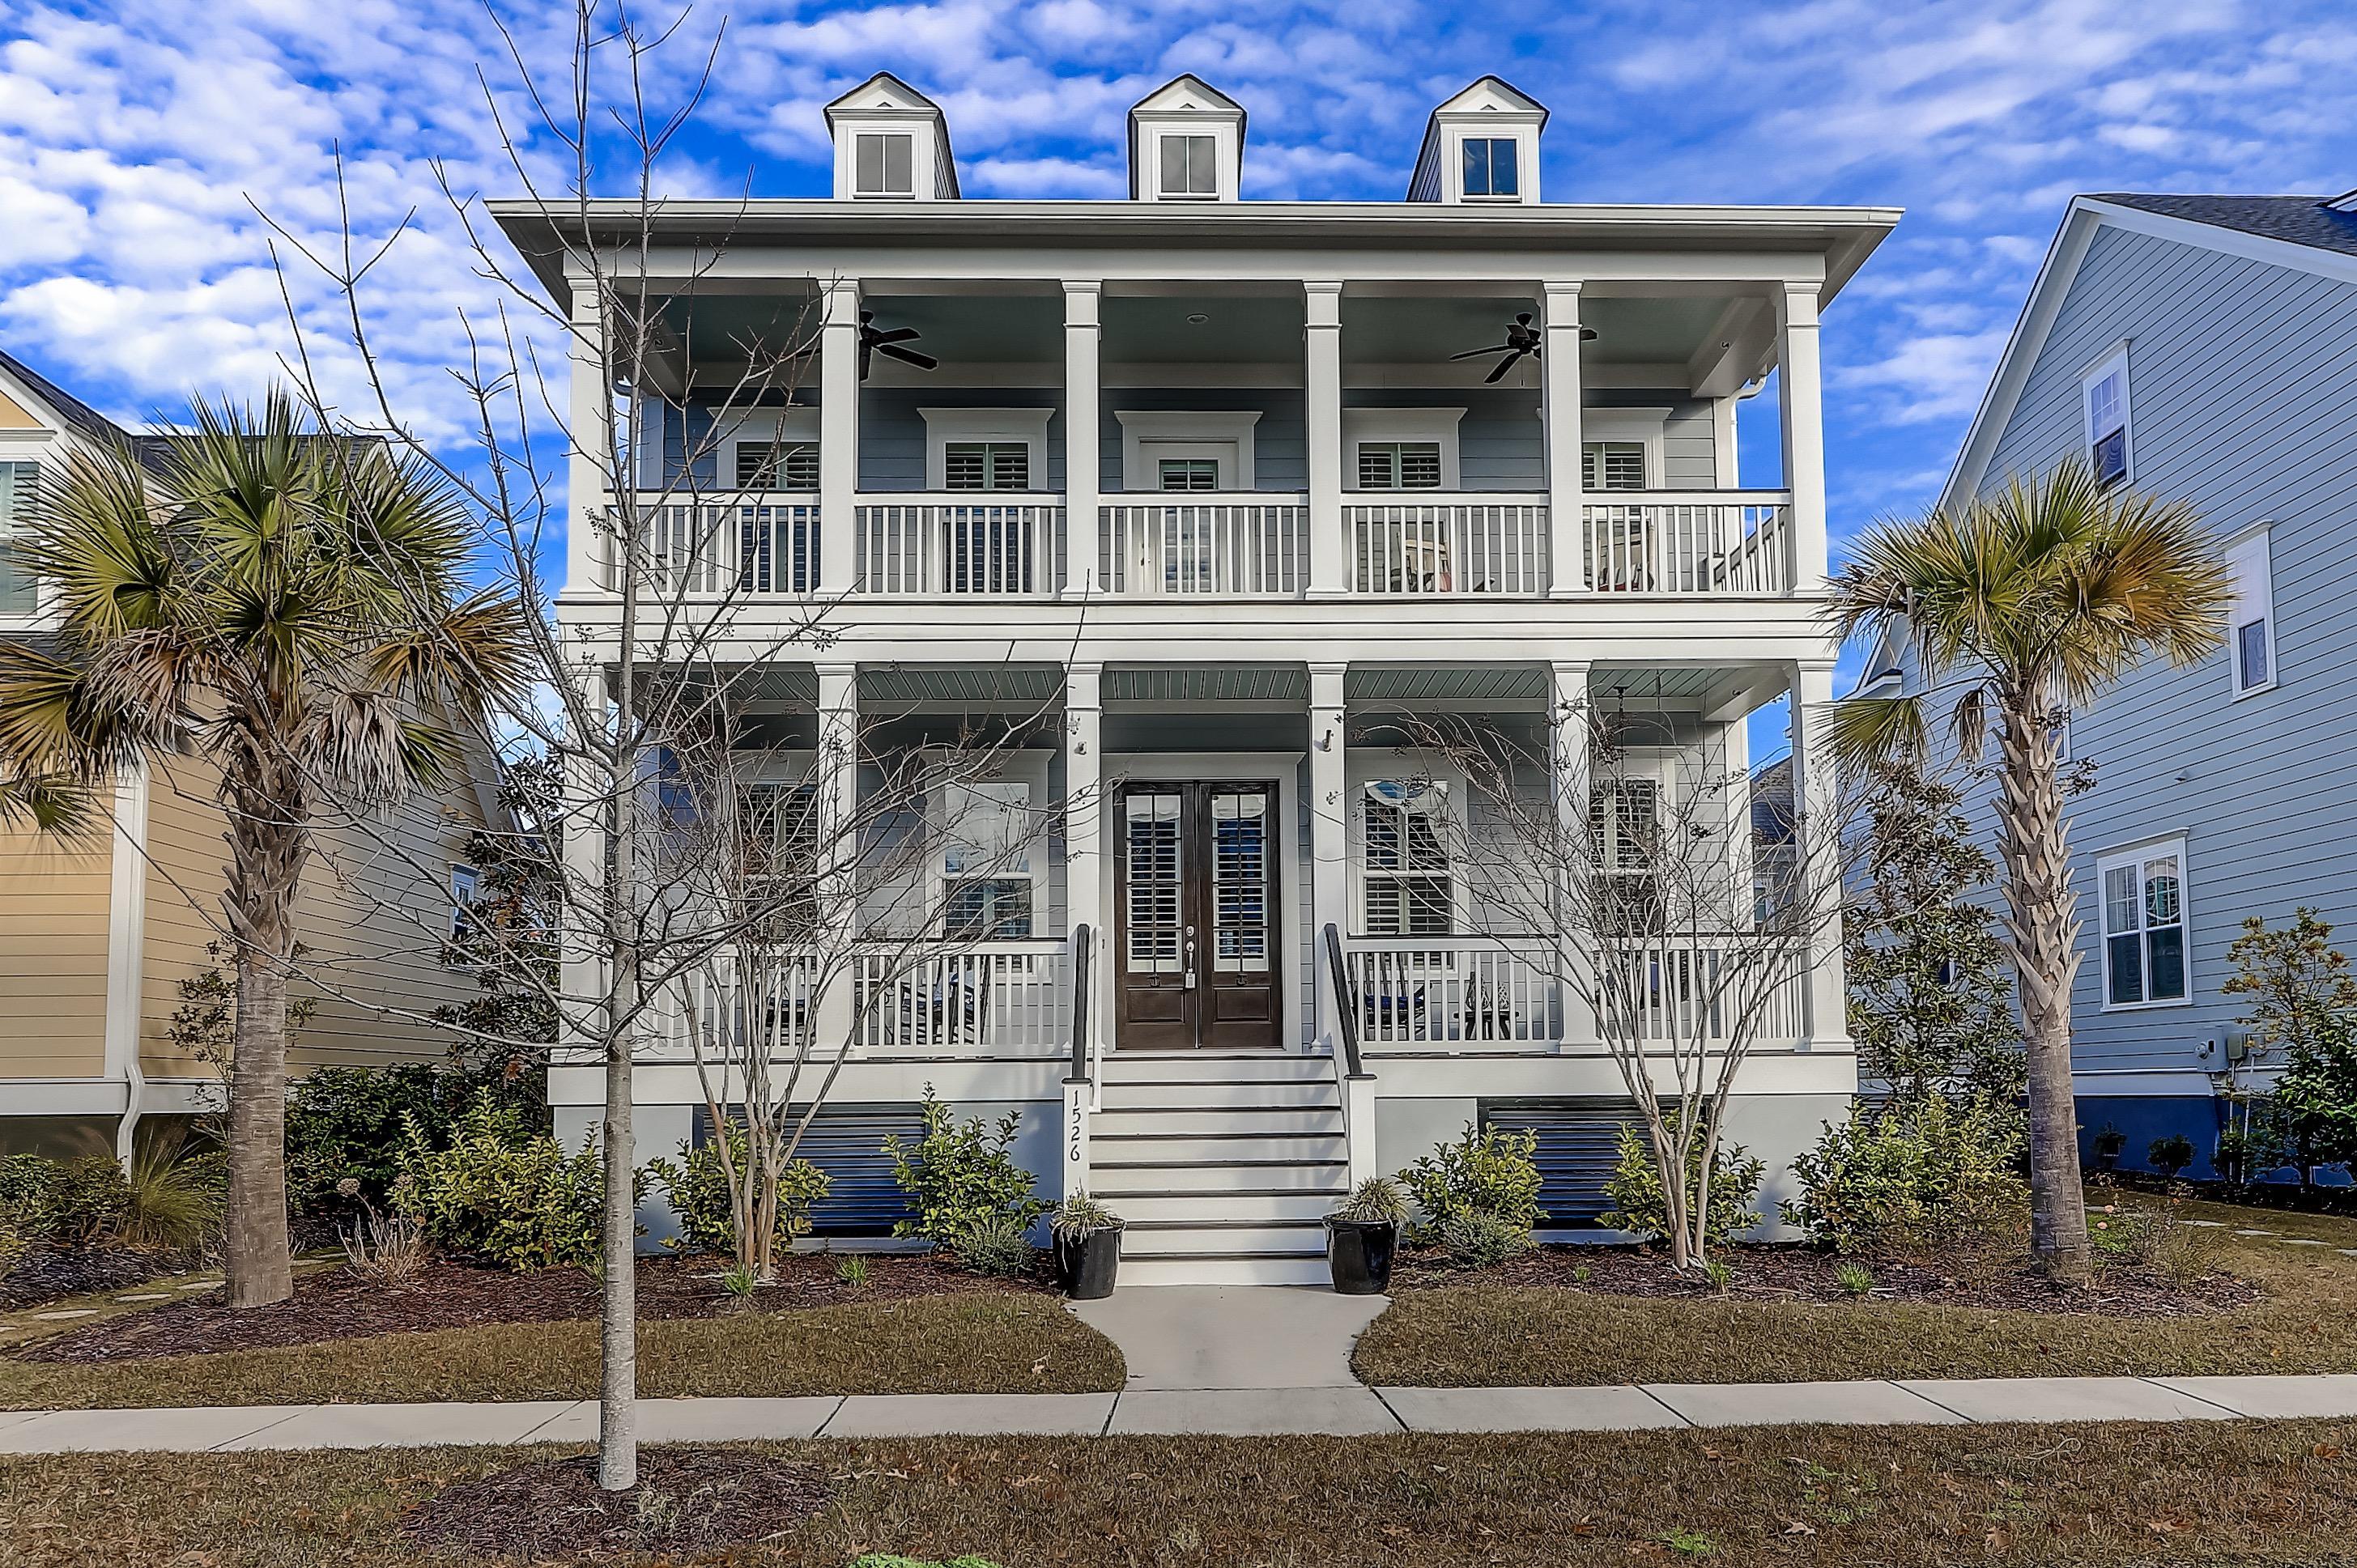 Daniel Island Homes For Sale - 1526 Willtown, Daniel Island, SC - 6